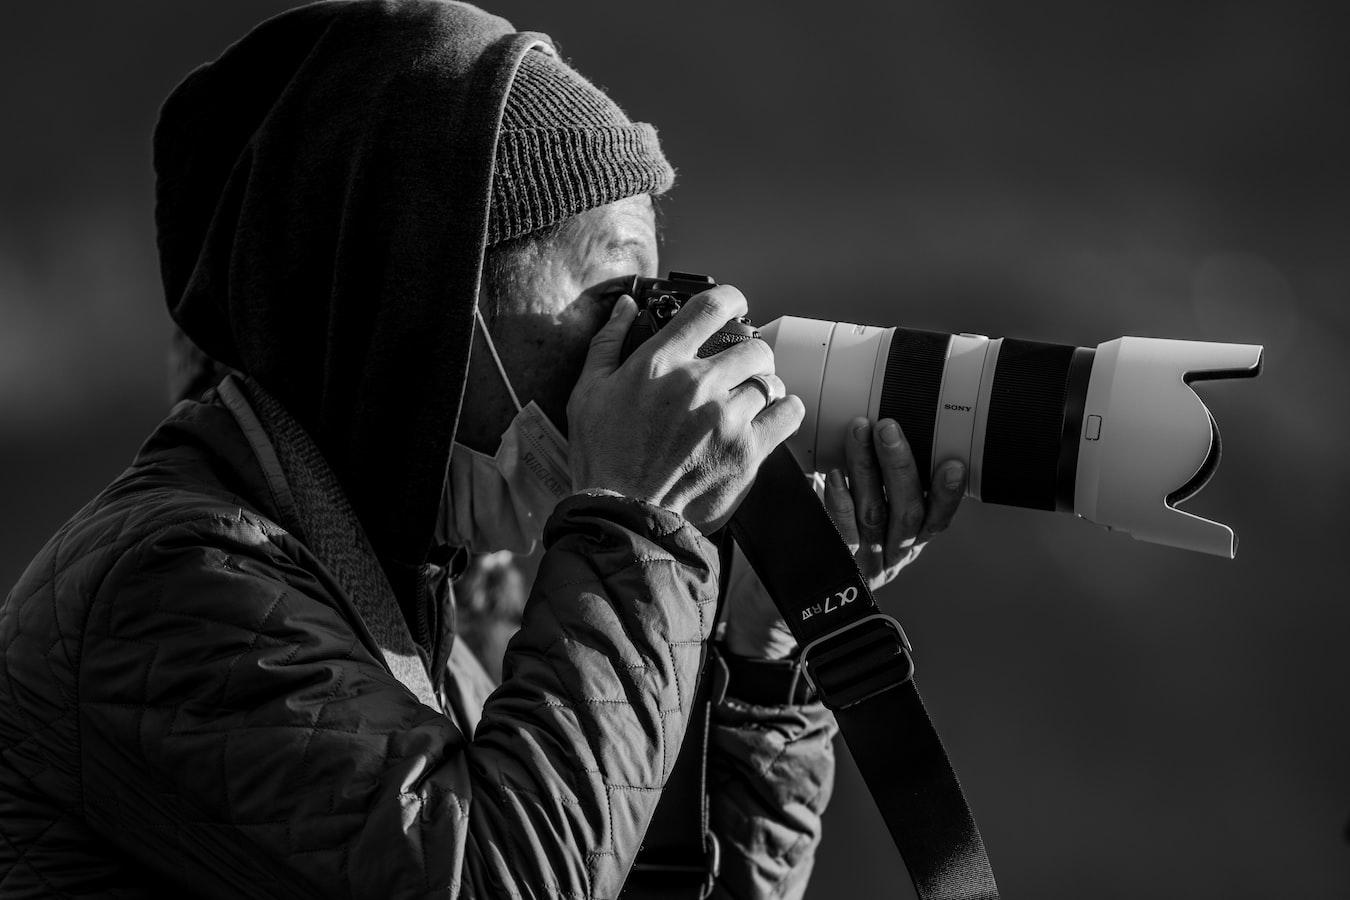 Belajar Fotografi #10: Mode AutoFocus (AF)